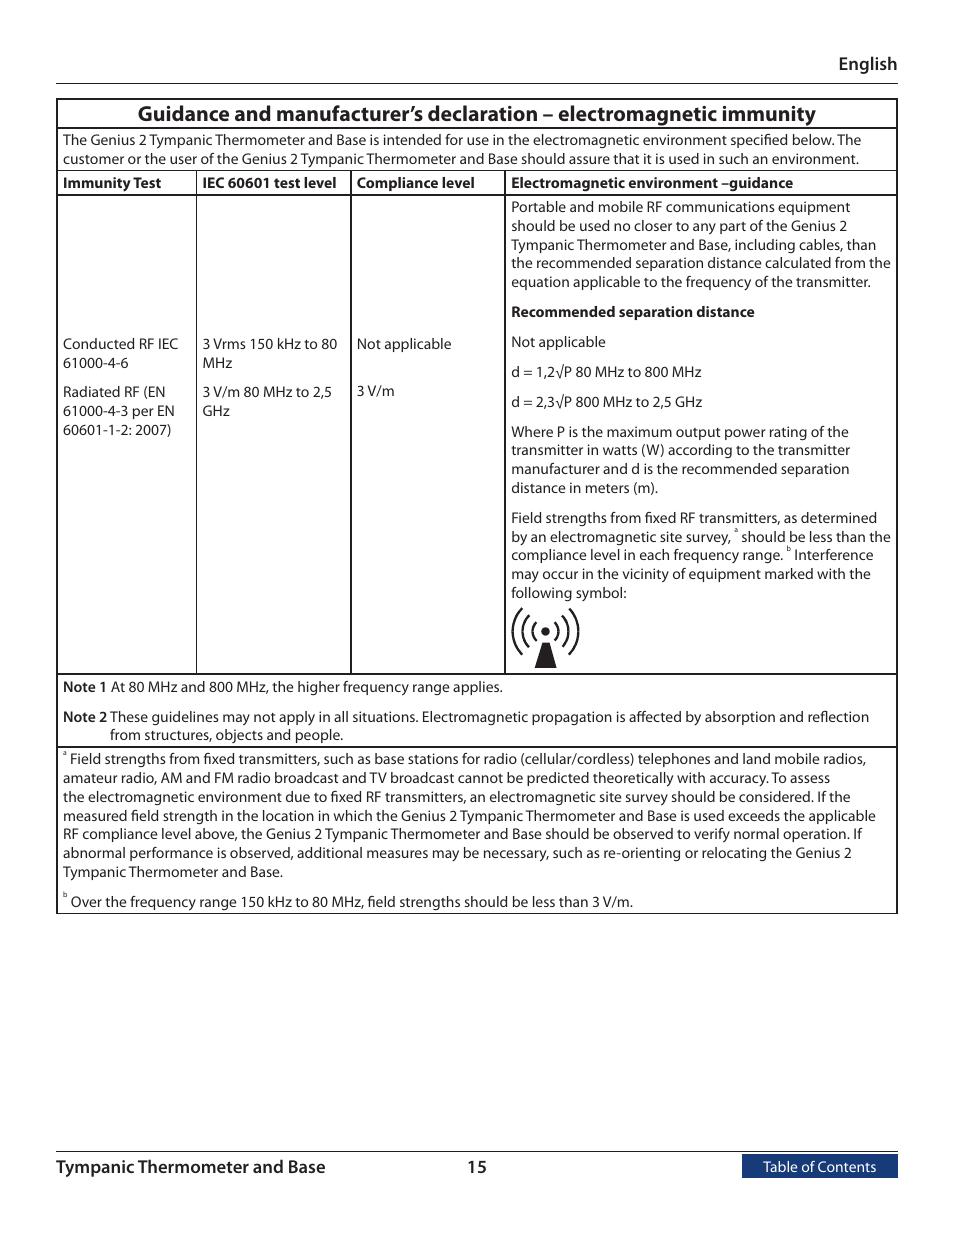 Covidien genius 2 tympanic thermometer user manual page 18 19 covidien genius 2 tympanic thermometer user manual page 18 19 biocorpaavc